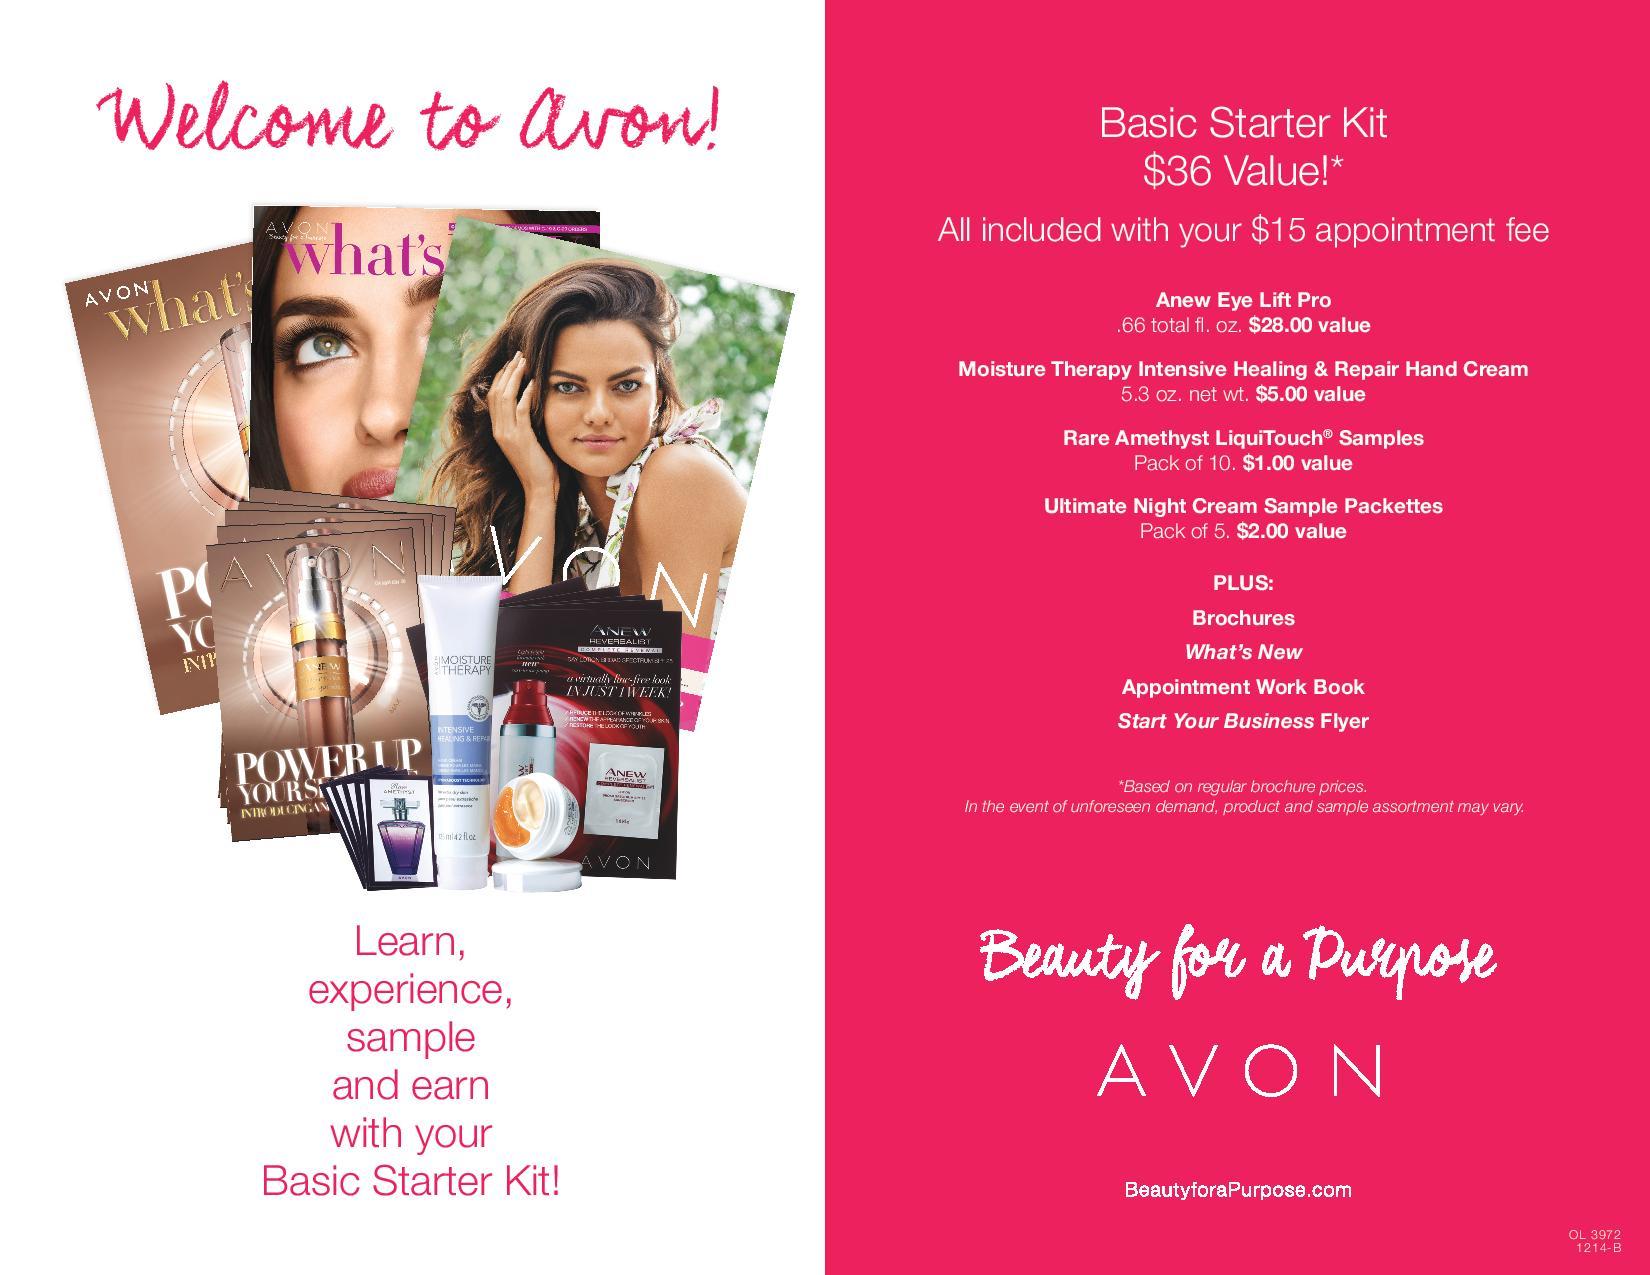 Avon Starter Kit >> New Avon Starter Kits! - Makeup Maven JessicaMakeup Maven Jessica